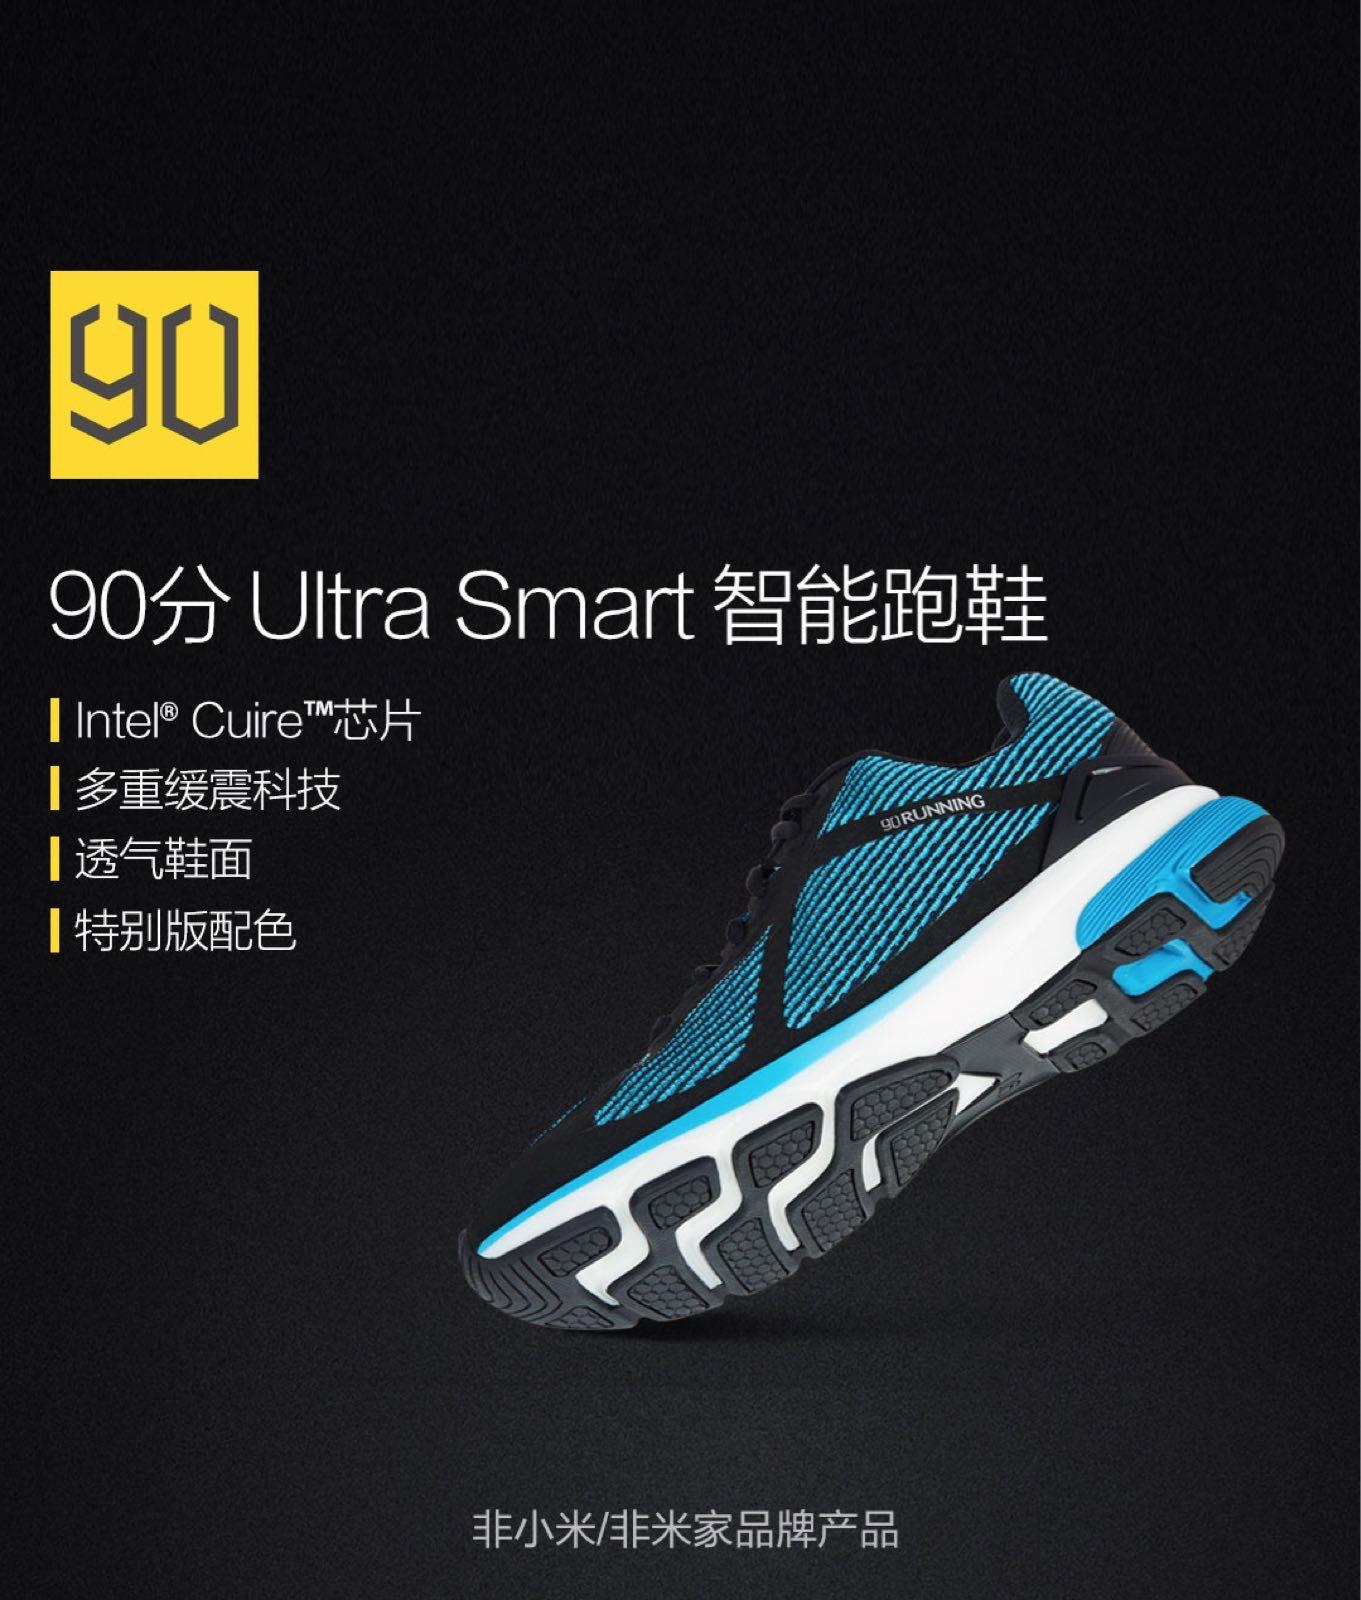 Xiaomi 90 Minutes Ultra Smart Características